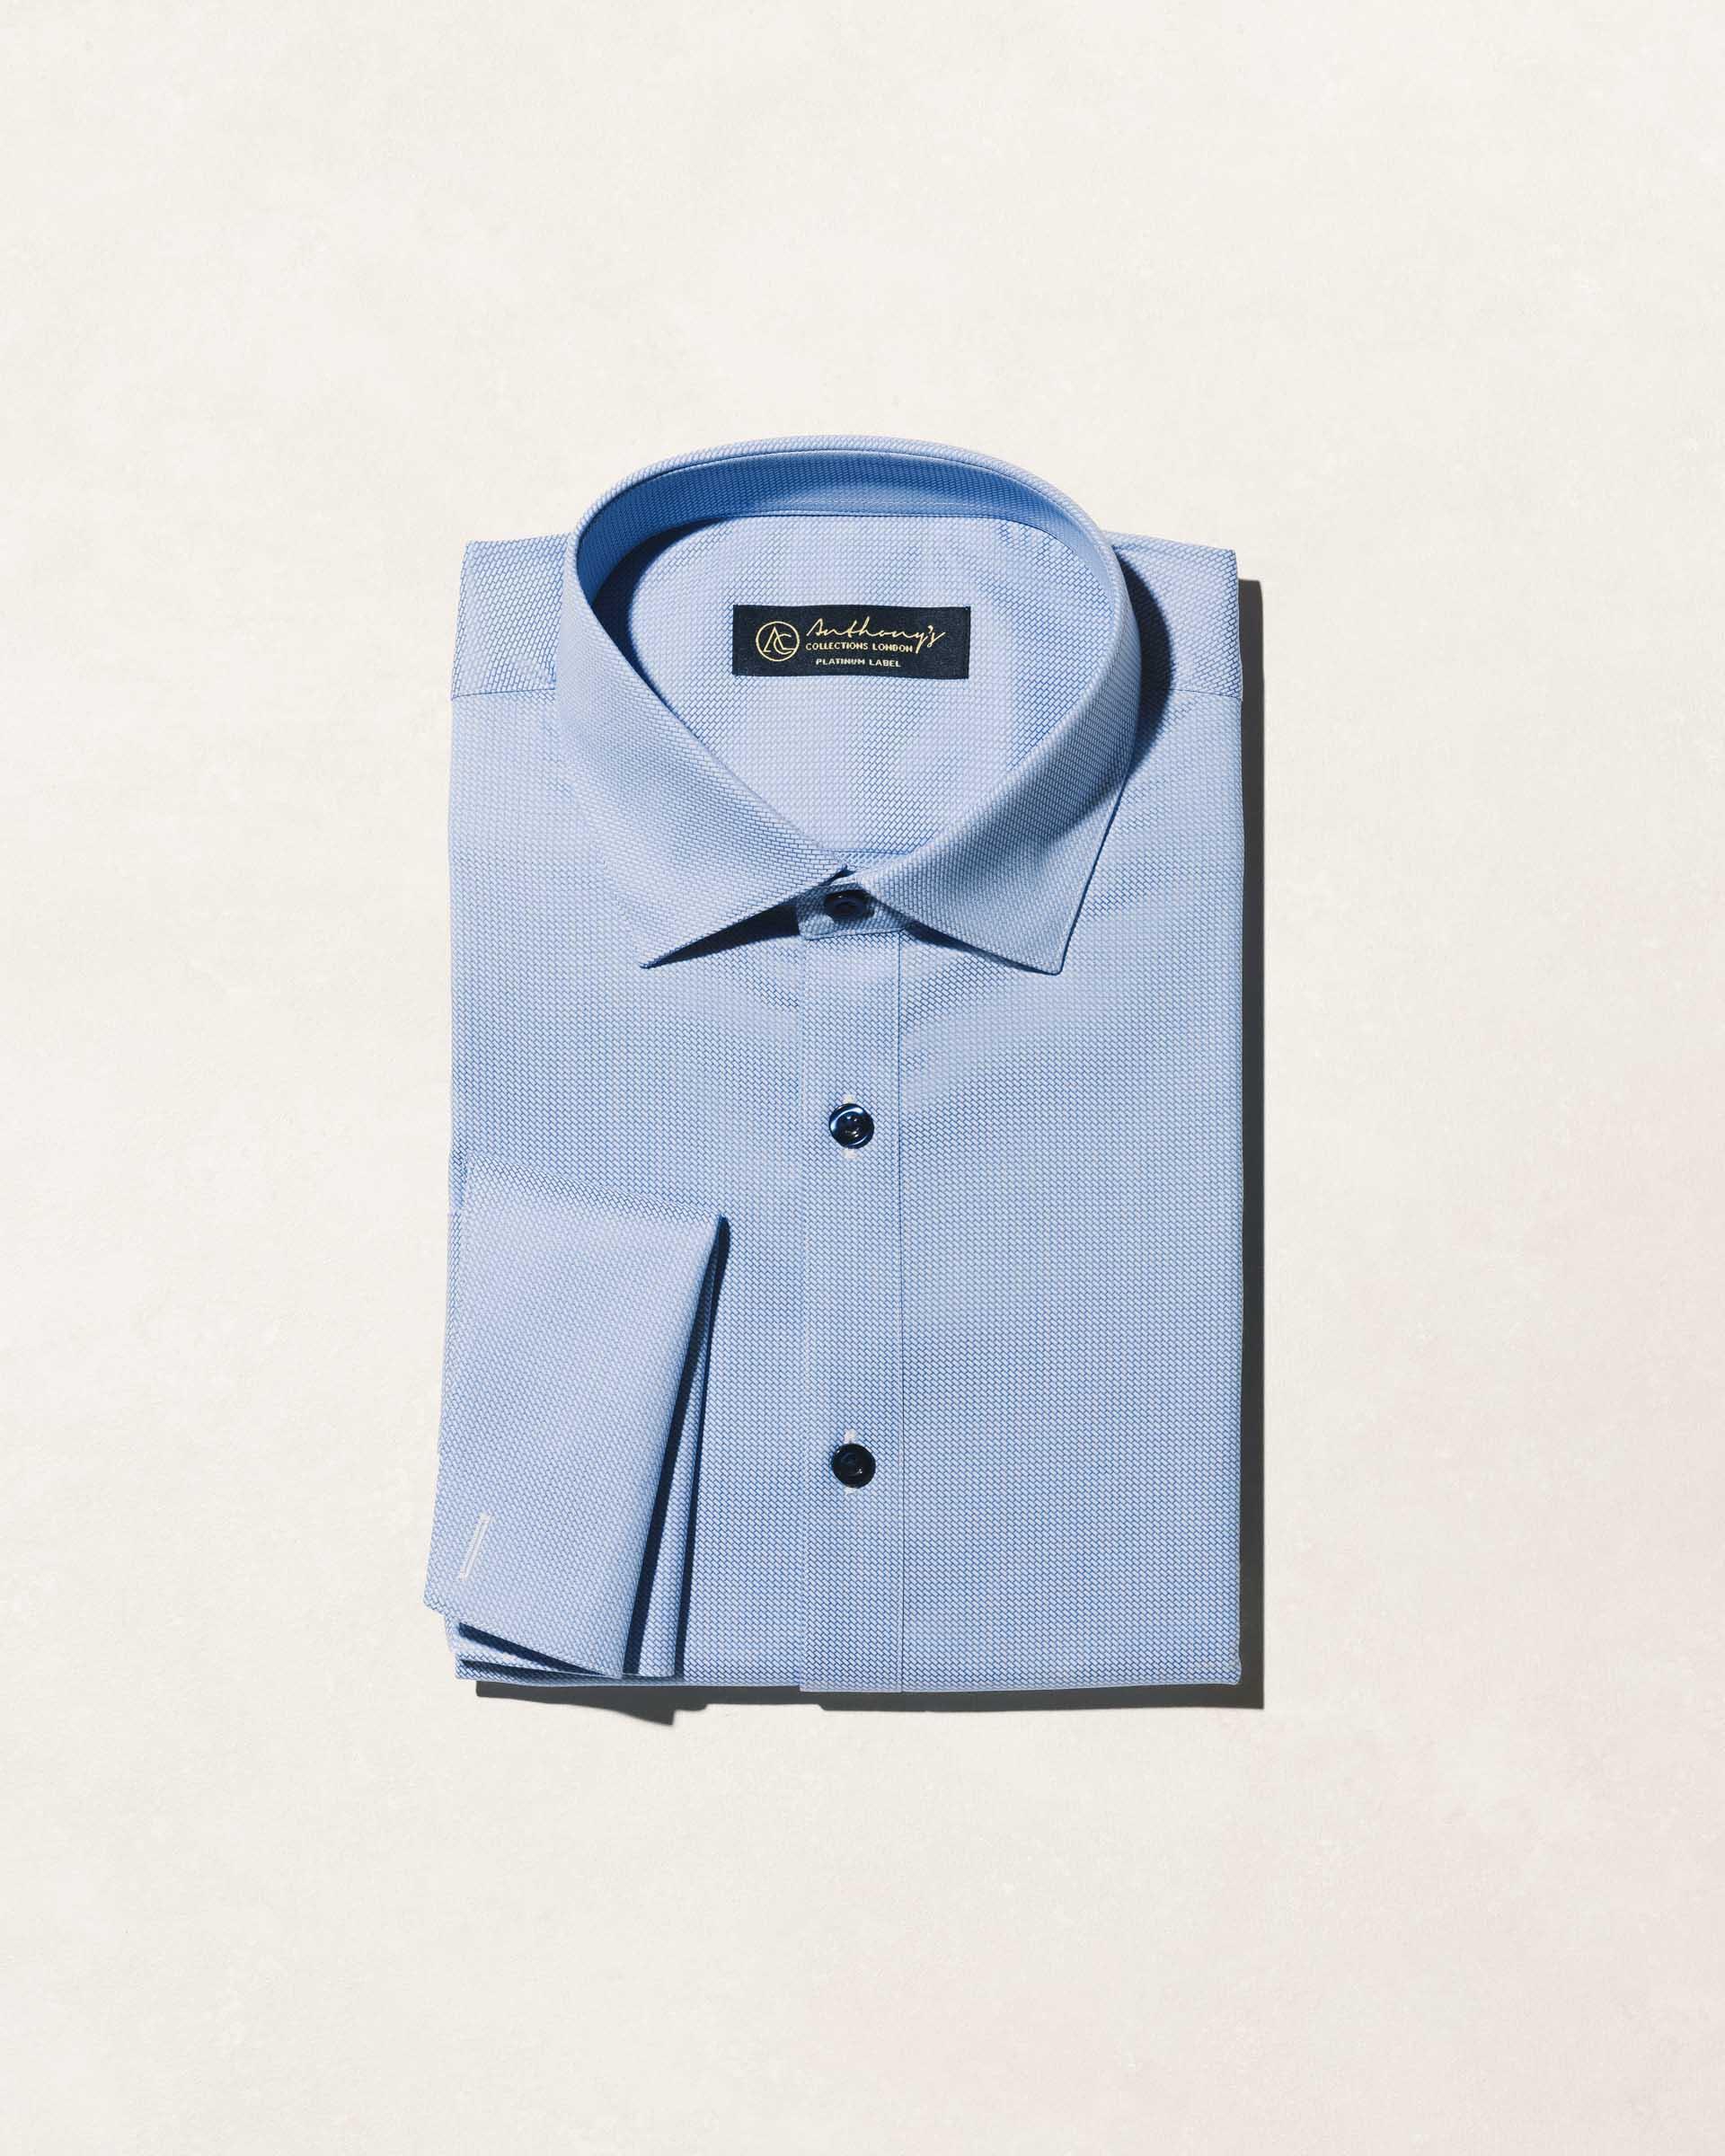 AL_Shirt HR0000_Web